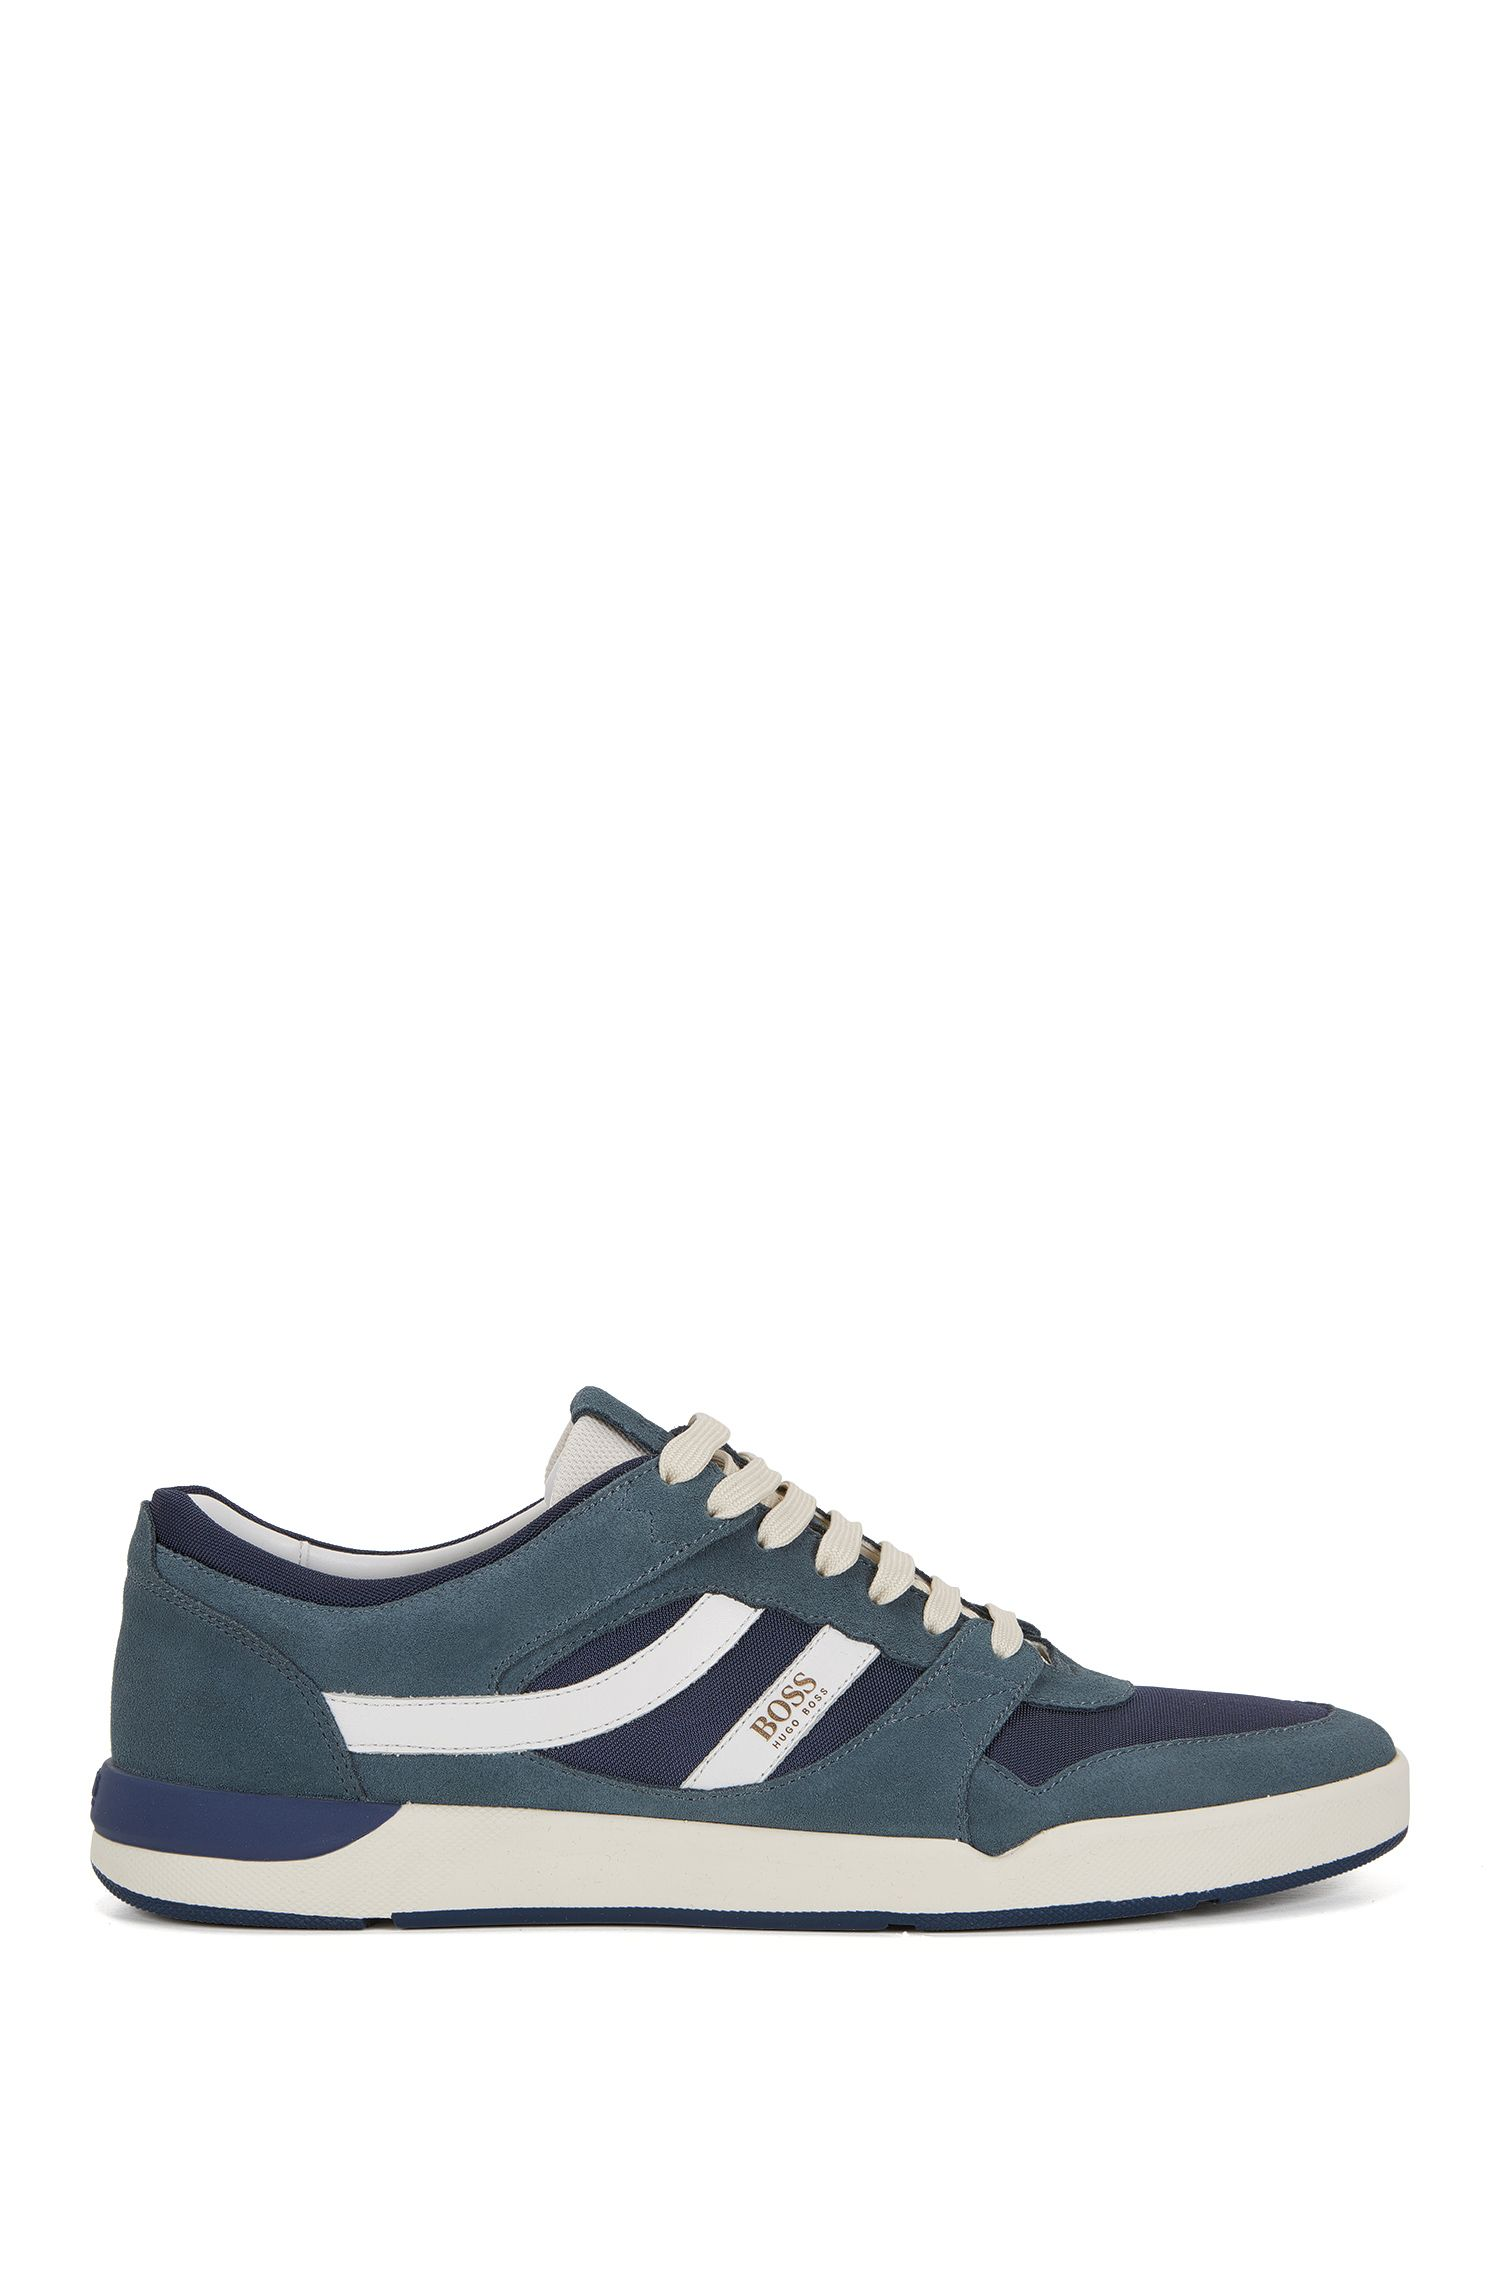 Sneakers aus Material-Mix und Veloursleder